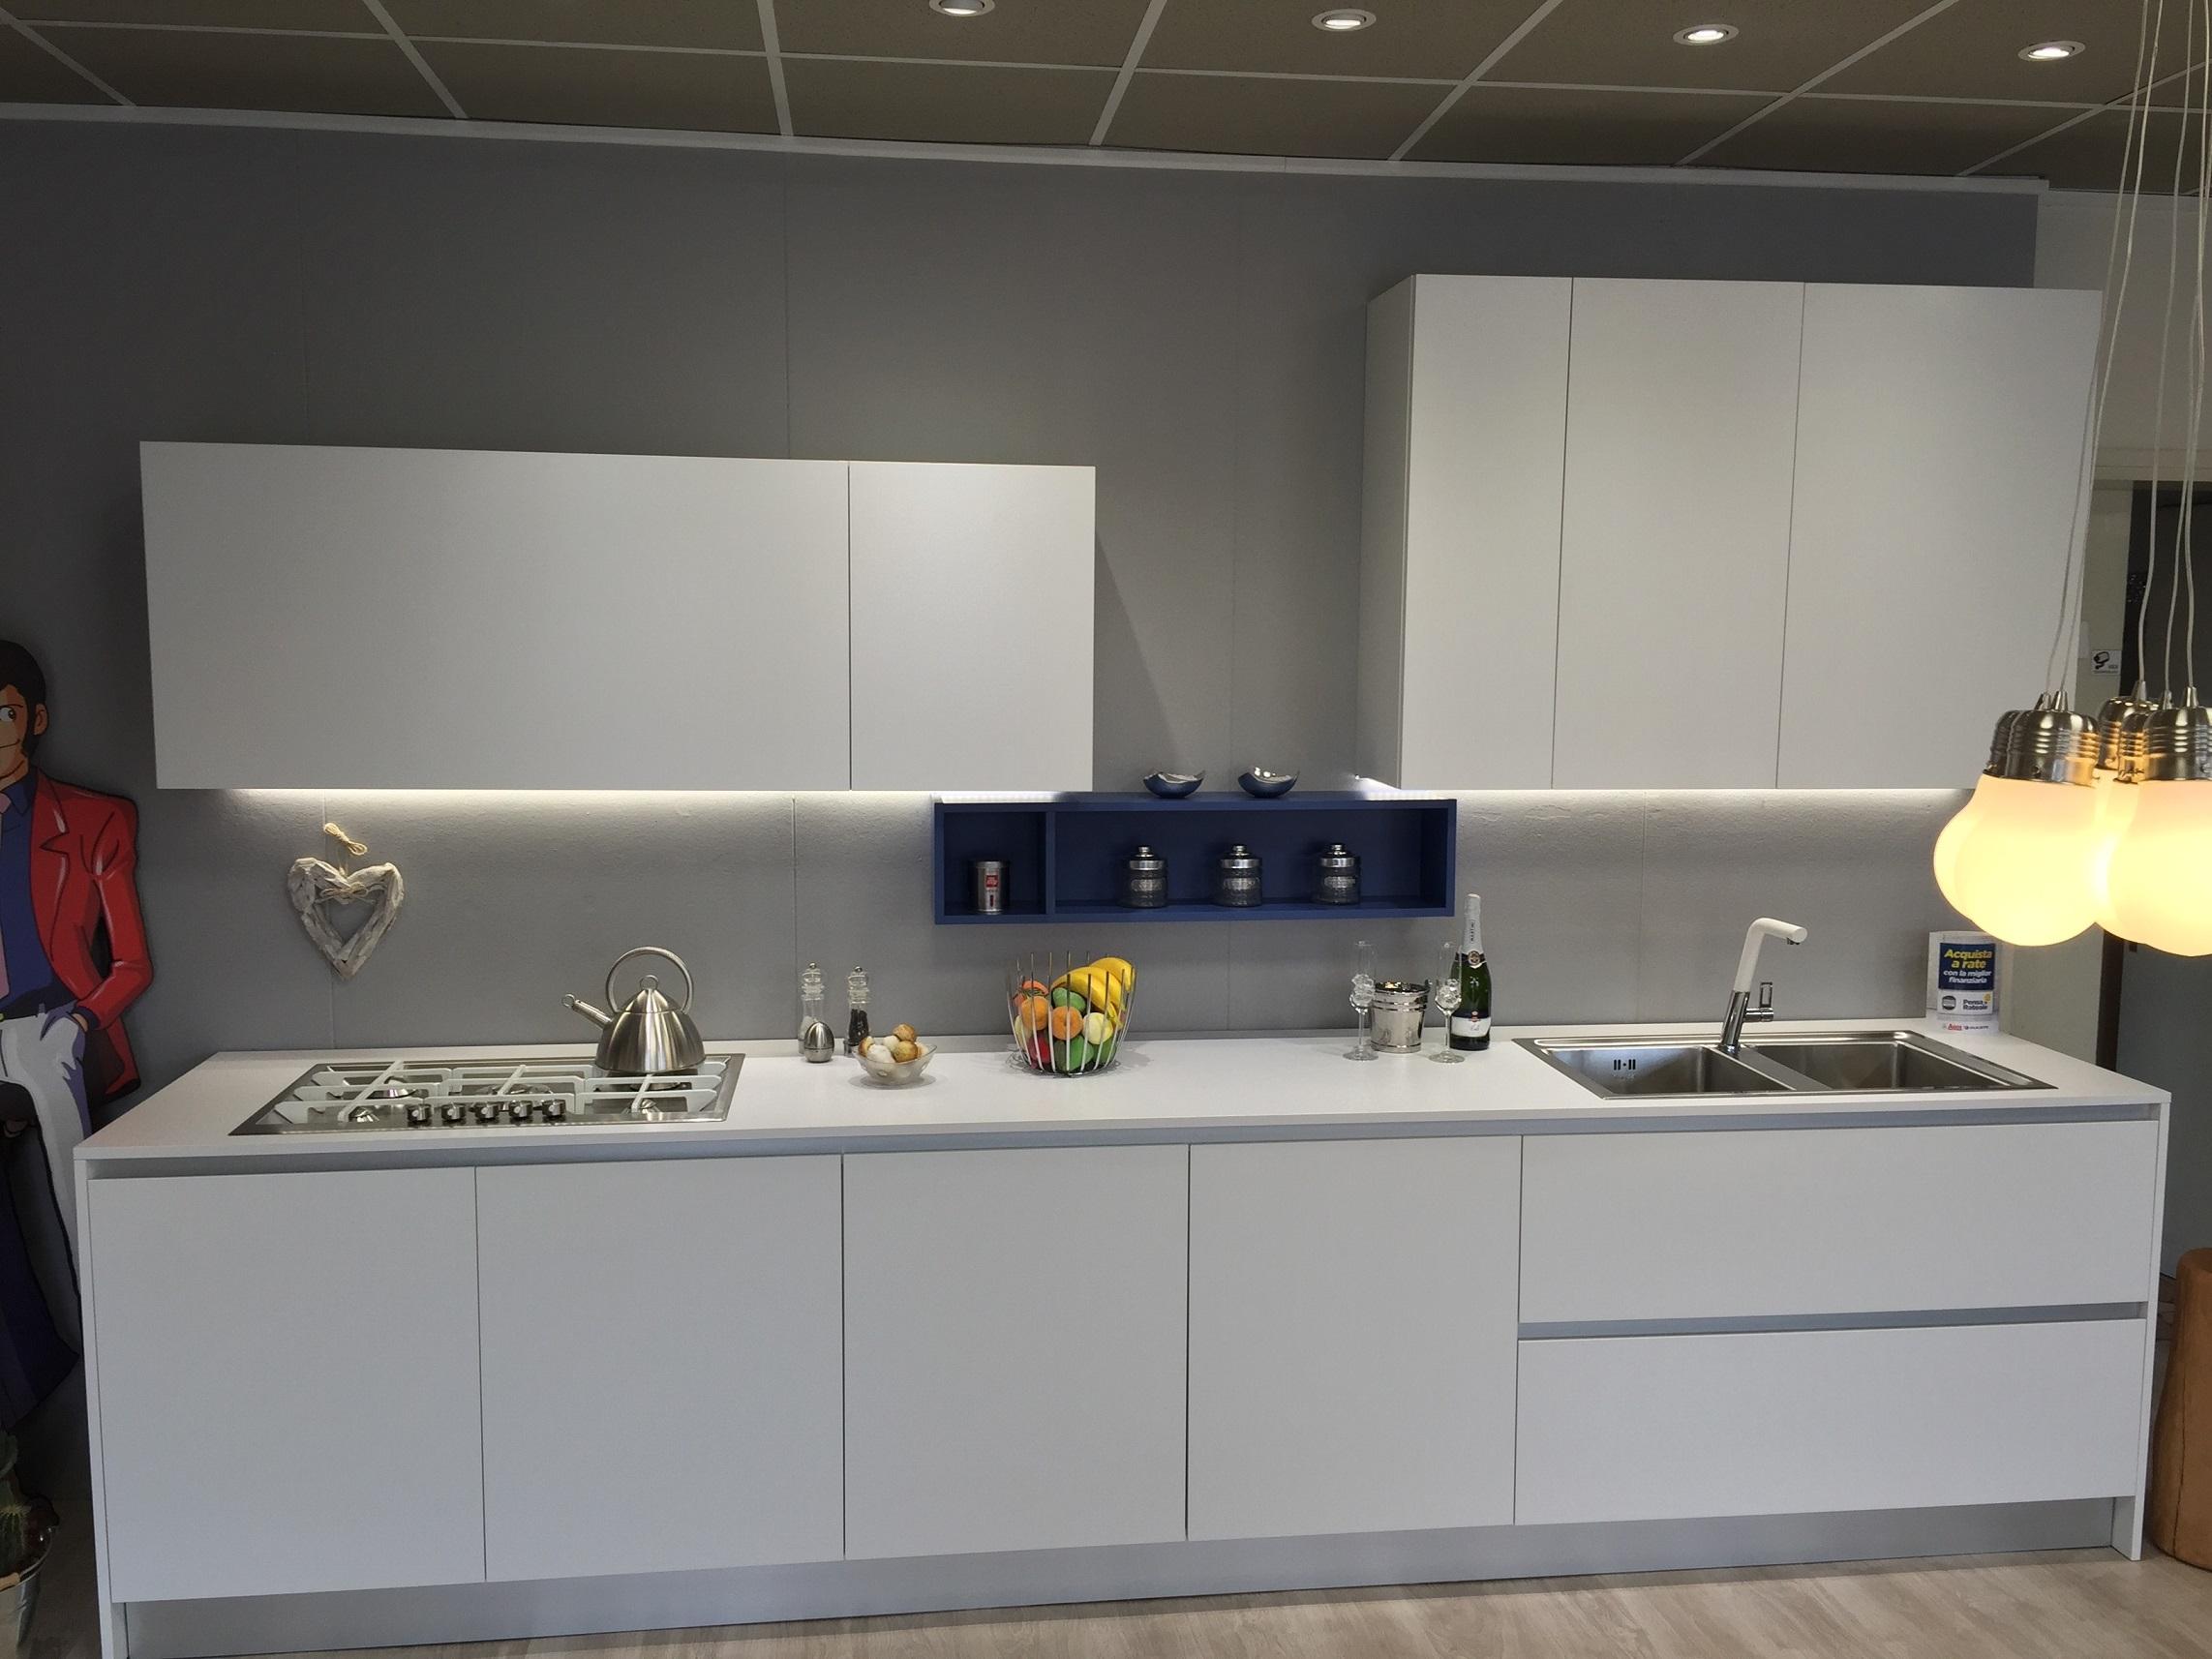 Emejing Prezzi Cucine Doimo Contemporary - Home Design Ideas 2017 ...